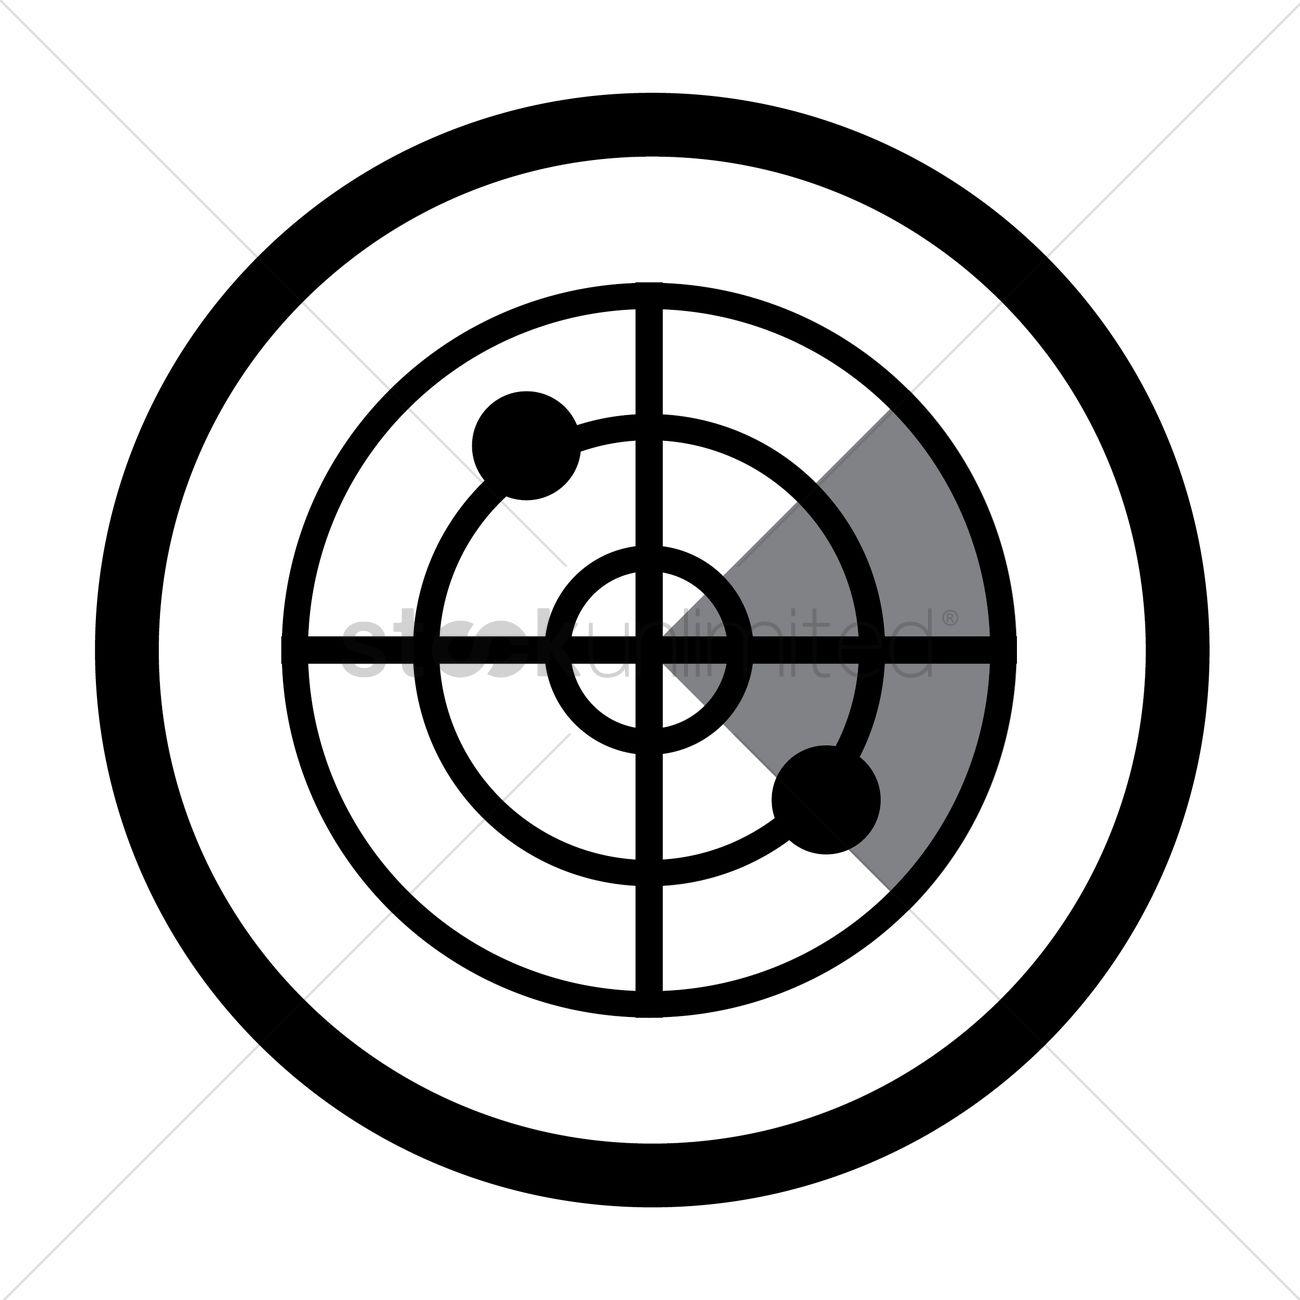 Radar Equipment Clipart 20 Free Cliparts